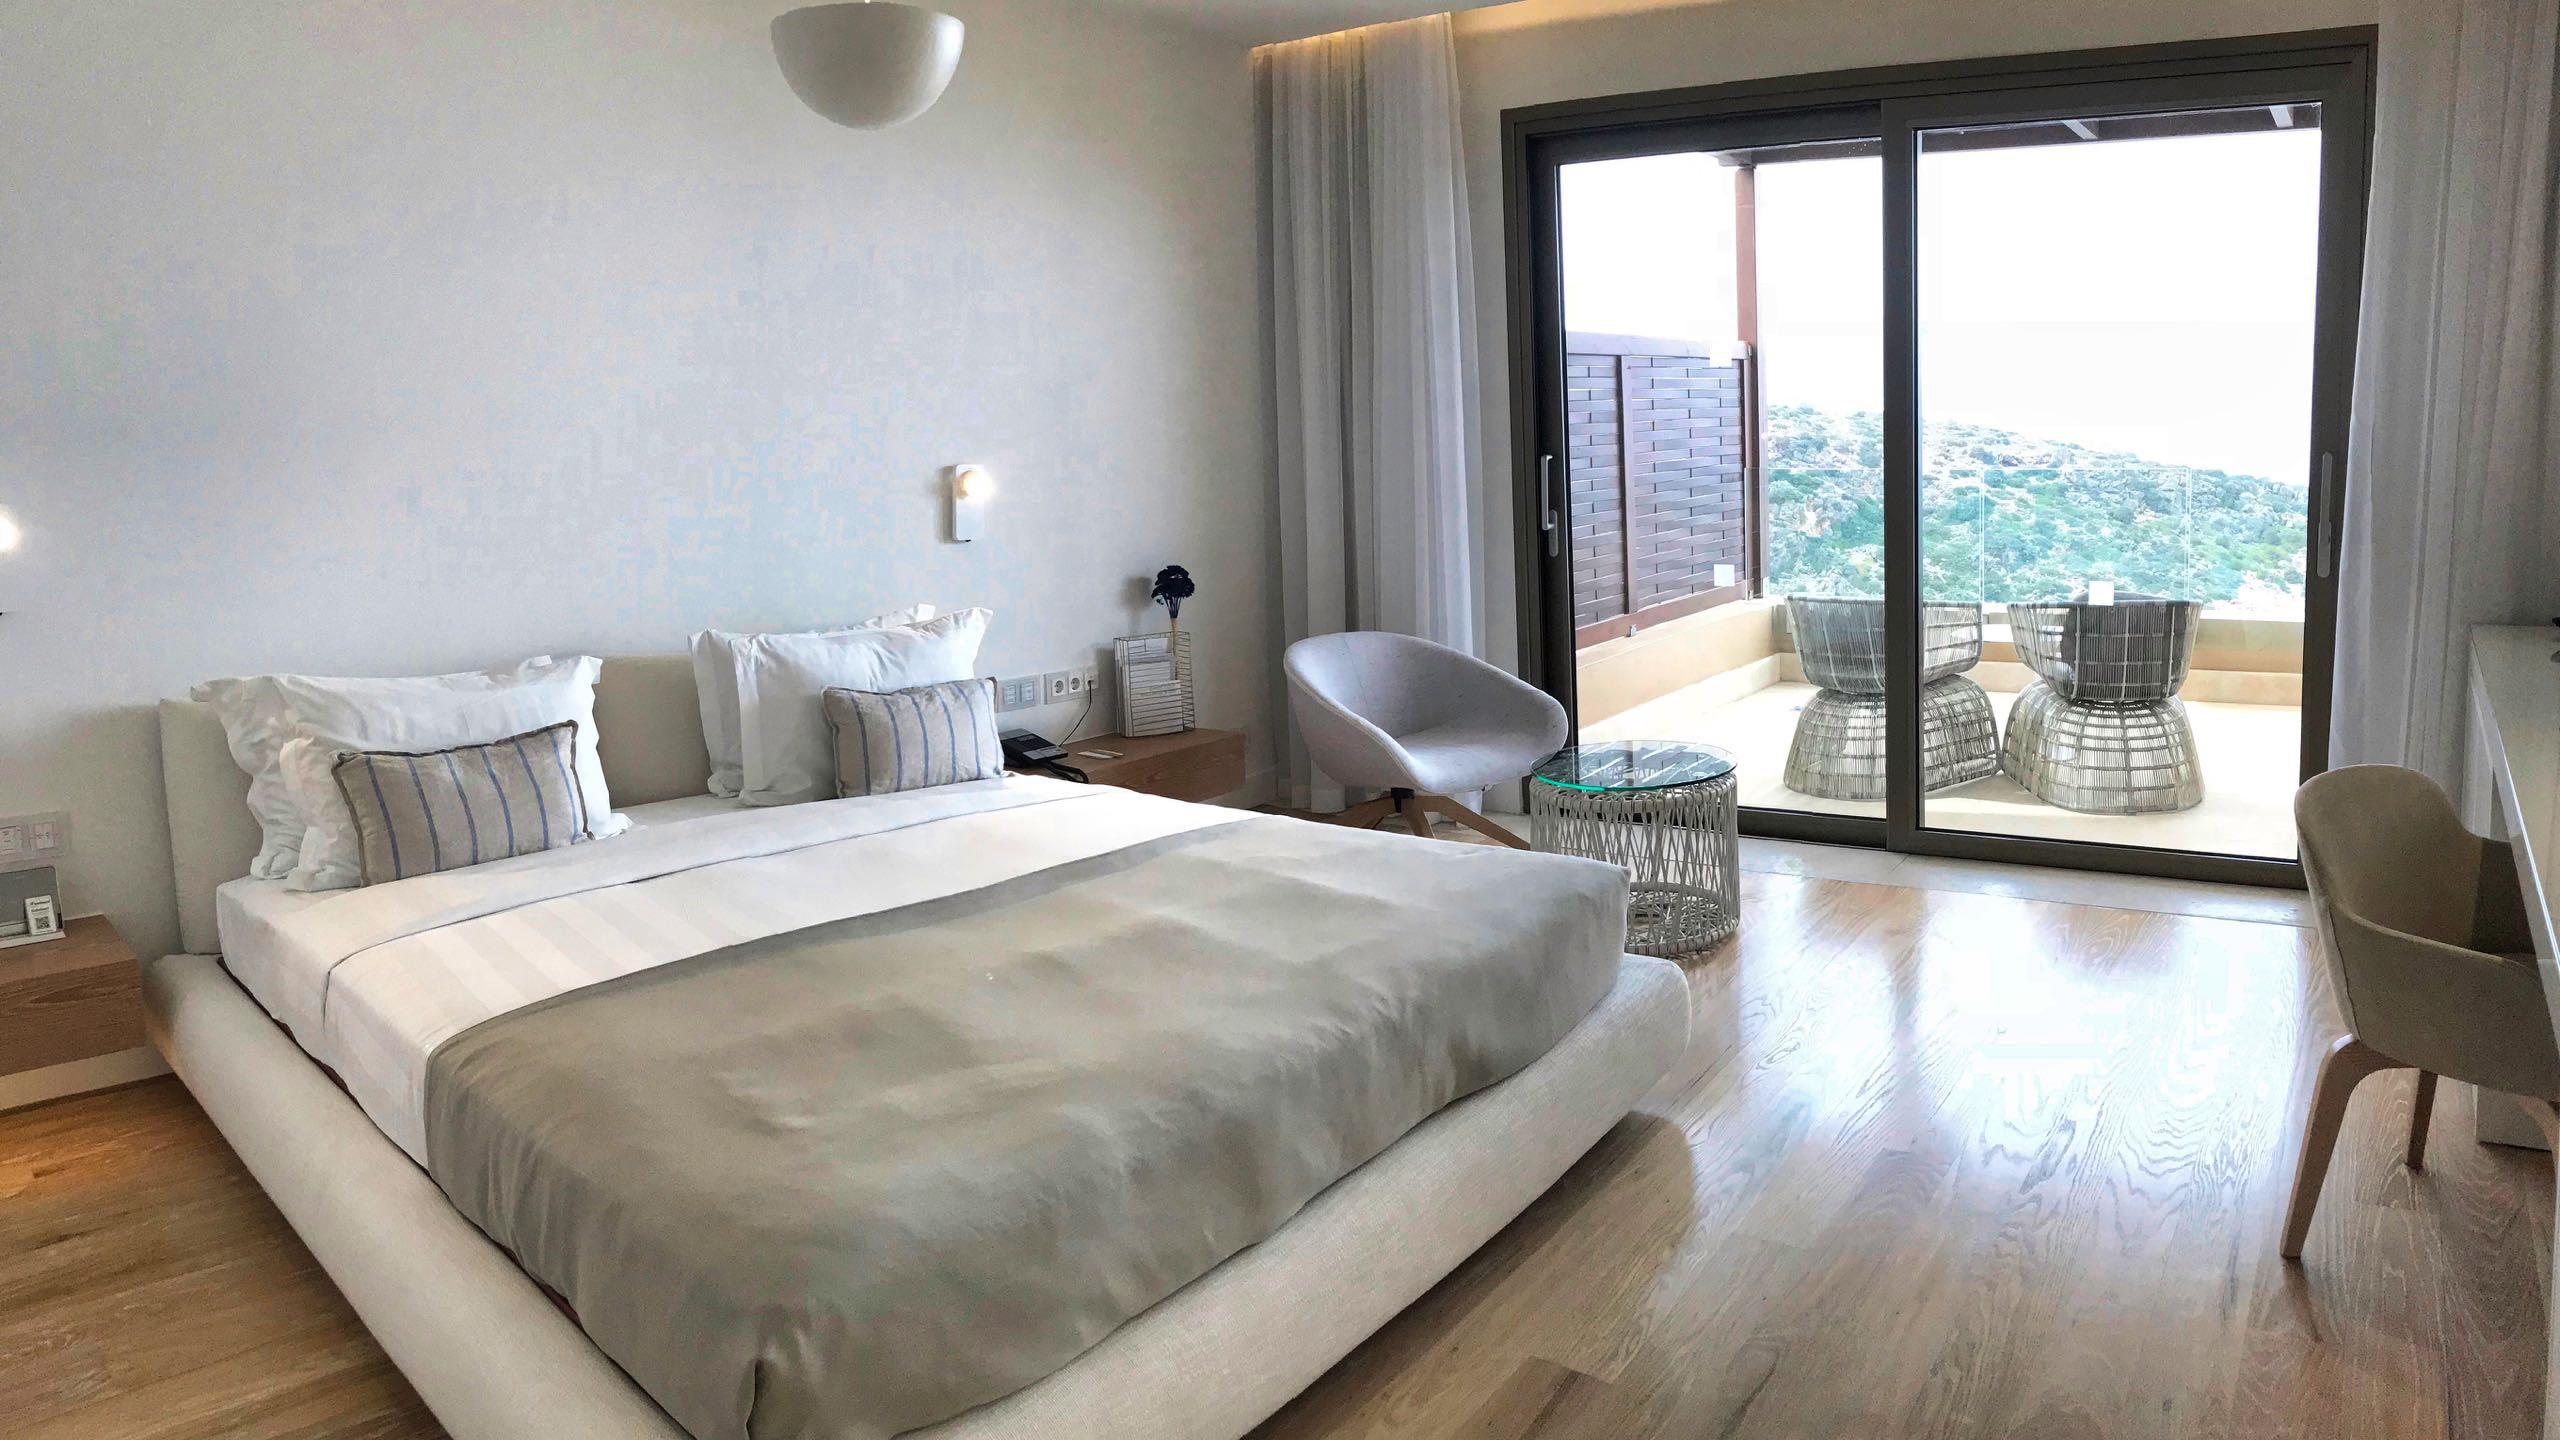 Hotel Daios Cove Kreta Luxus Villa Schlafzimmer